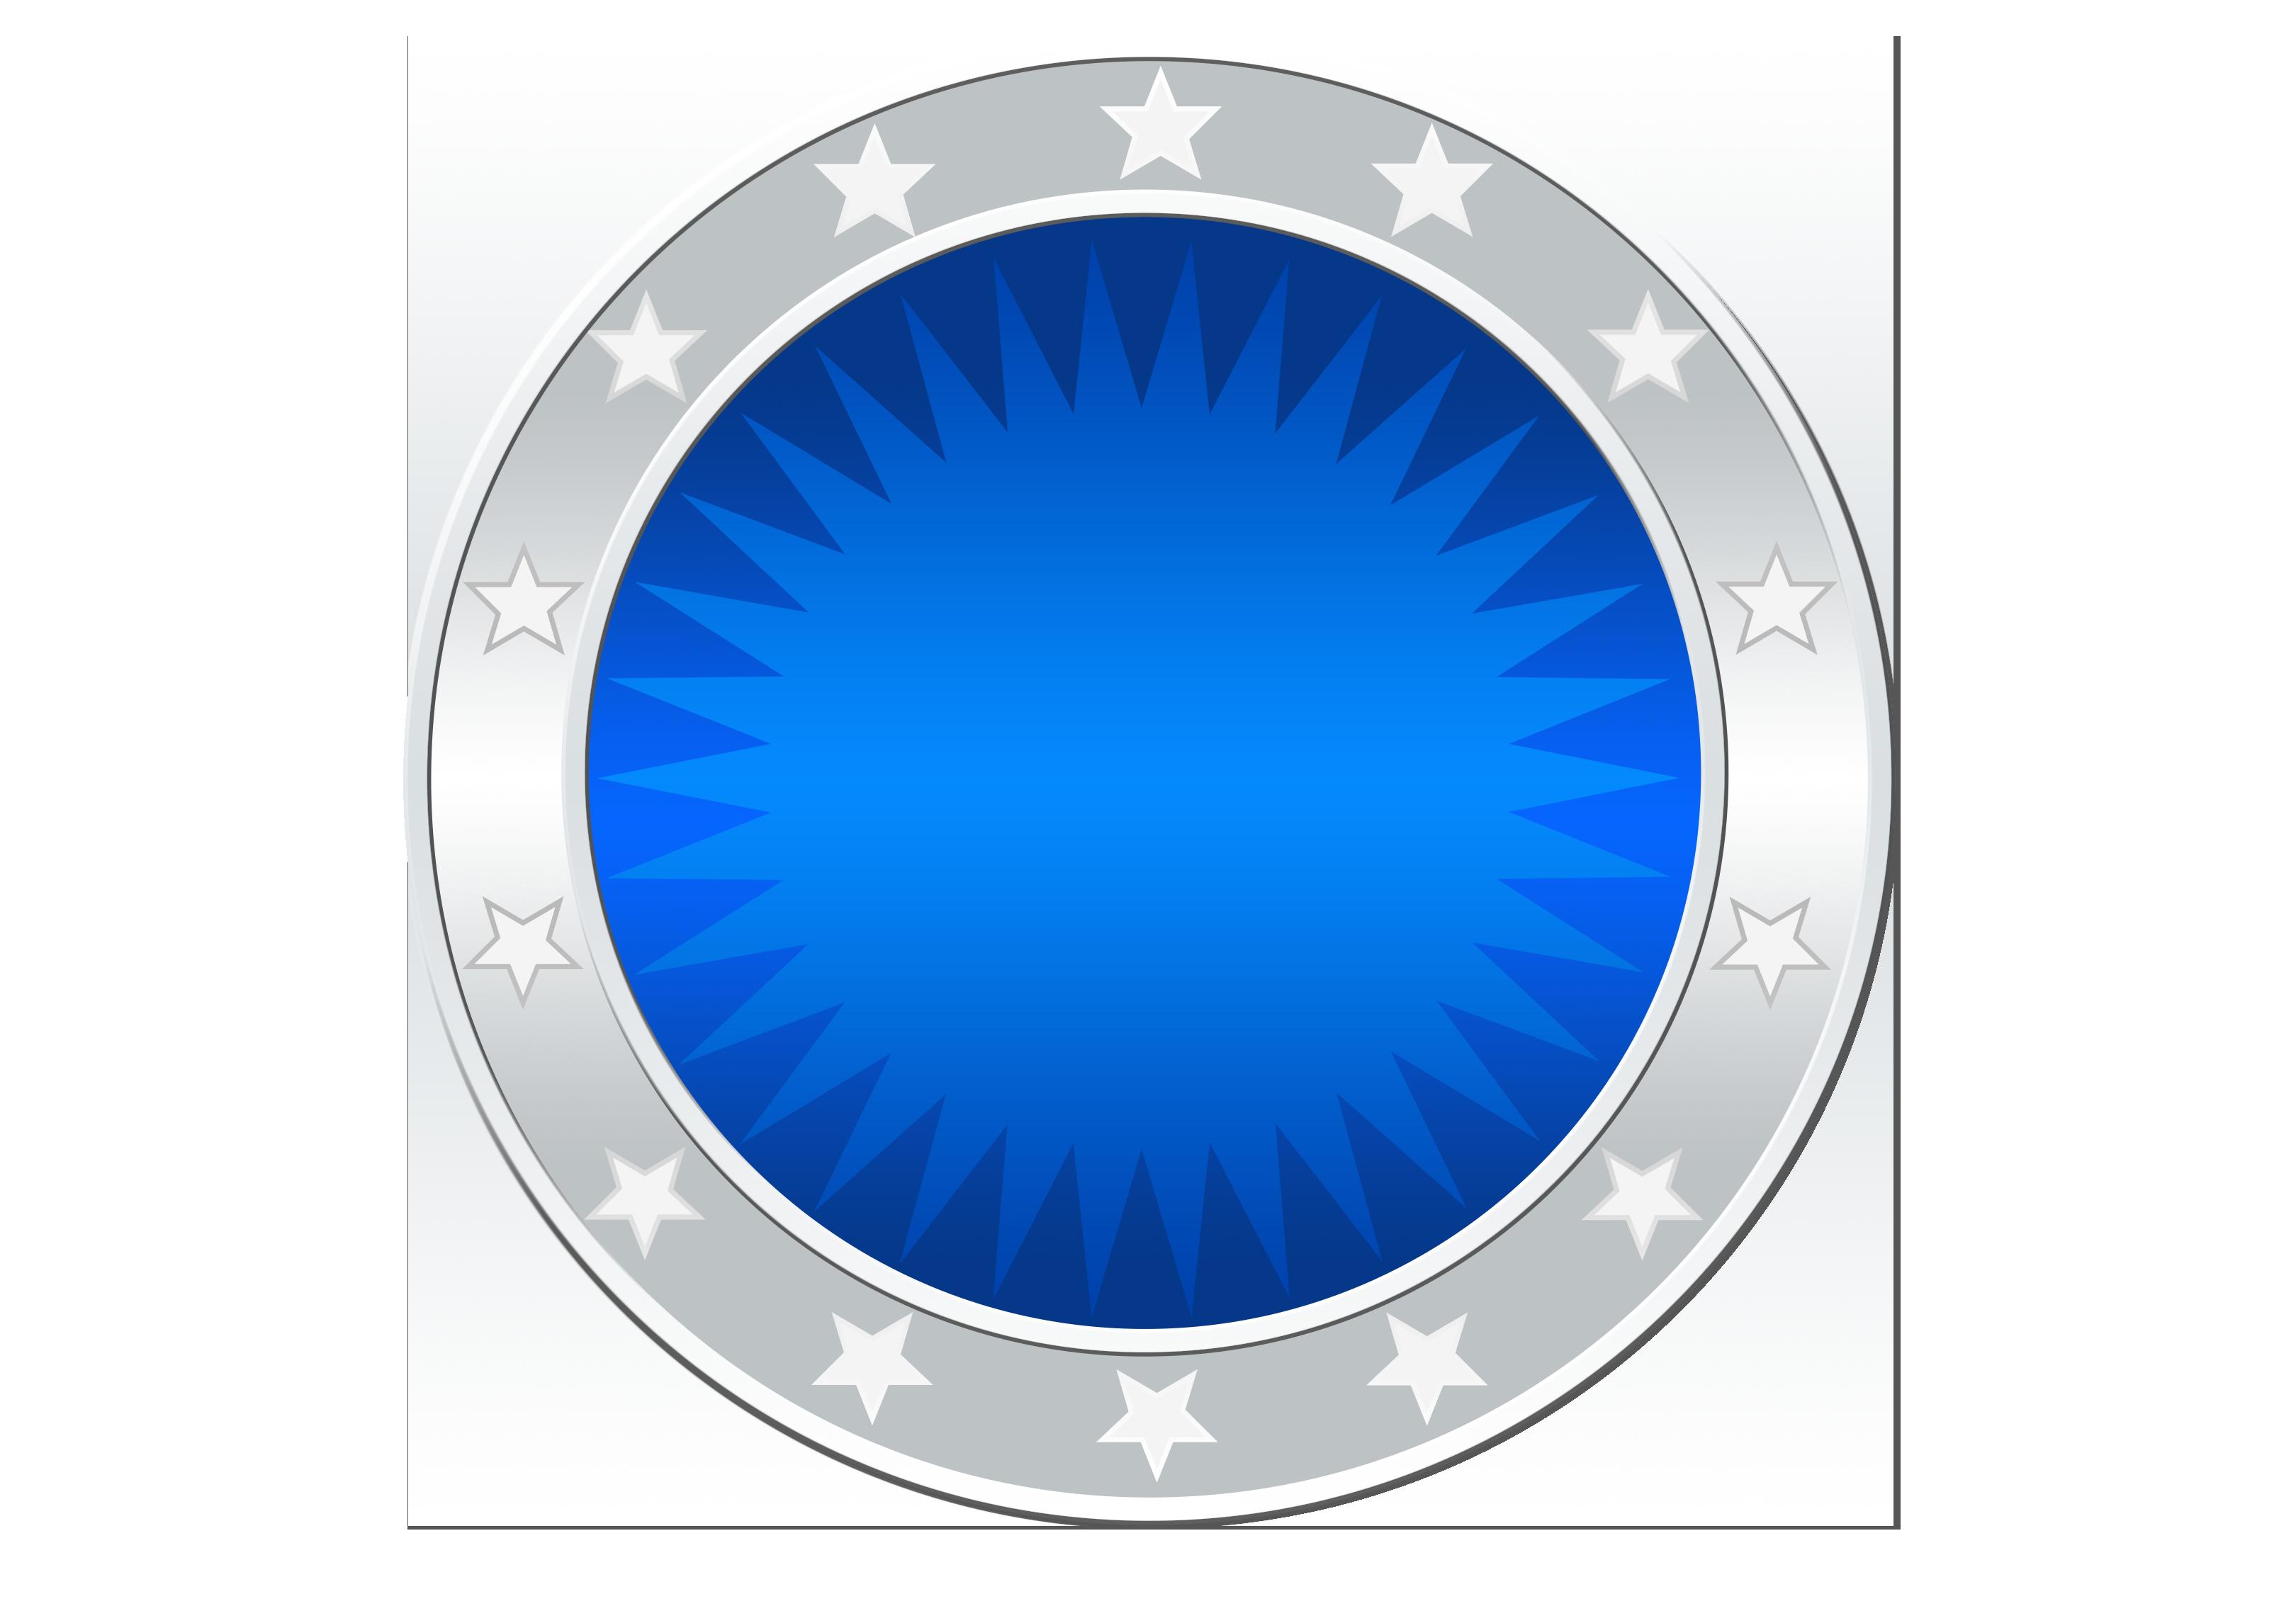 sonic 25th anniversary icon template by nuryrush on deviantart 25th Anniversary Backgrounds 25th Anniversary Logo Ideas